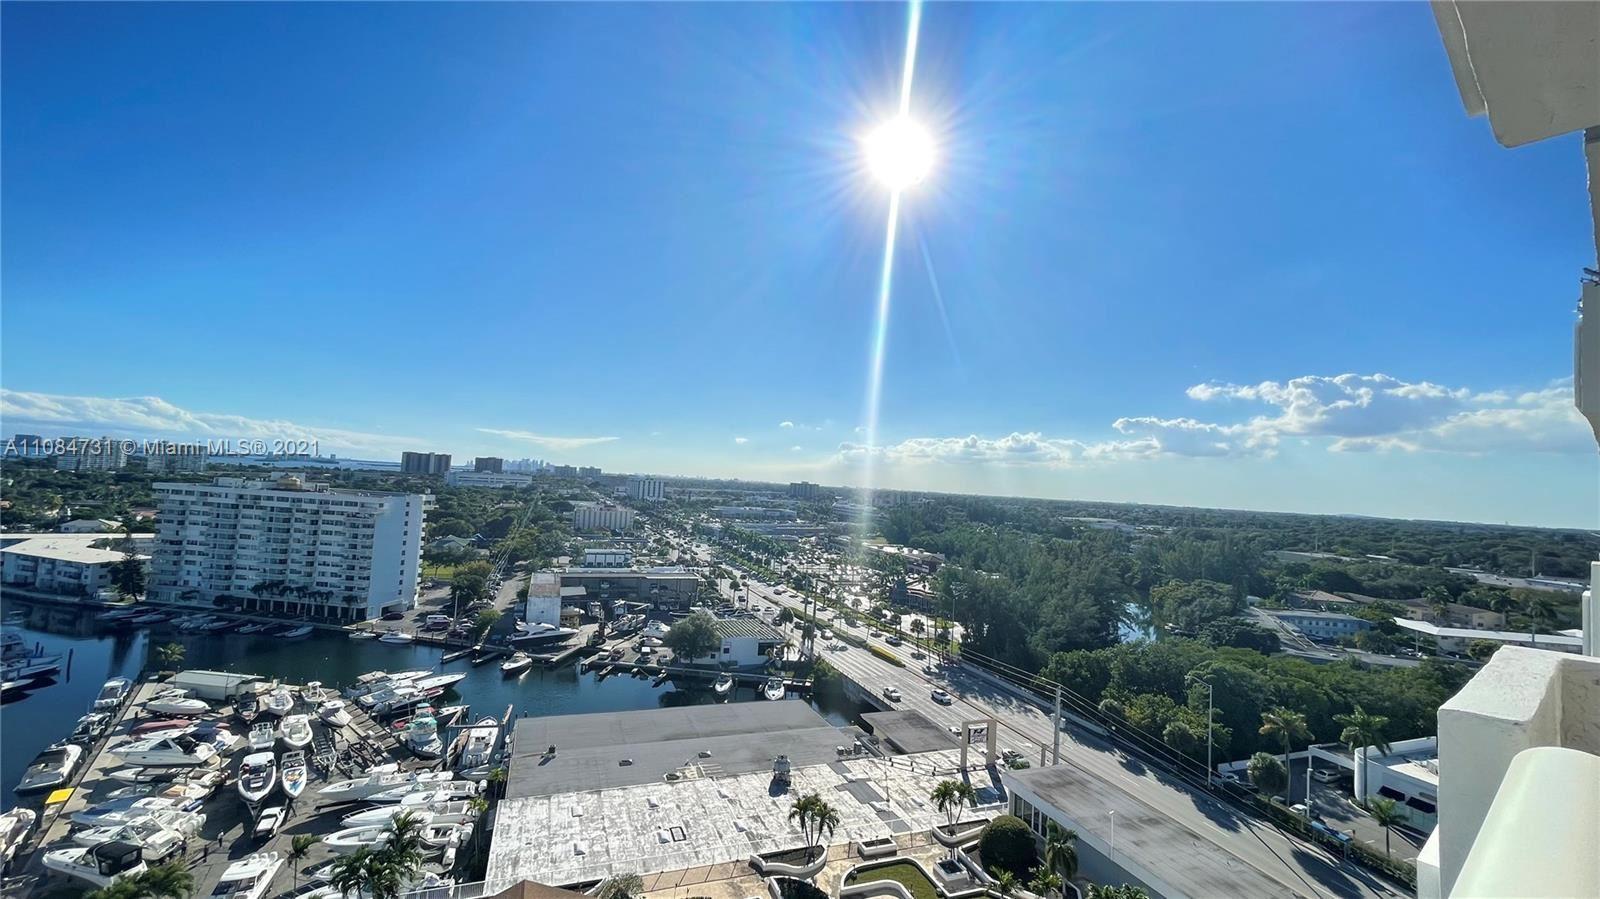 13499 Biscayne Blvd #1508, North Miami, FL 33181 - #: A11084731